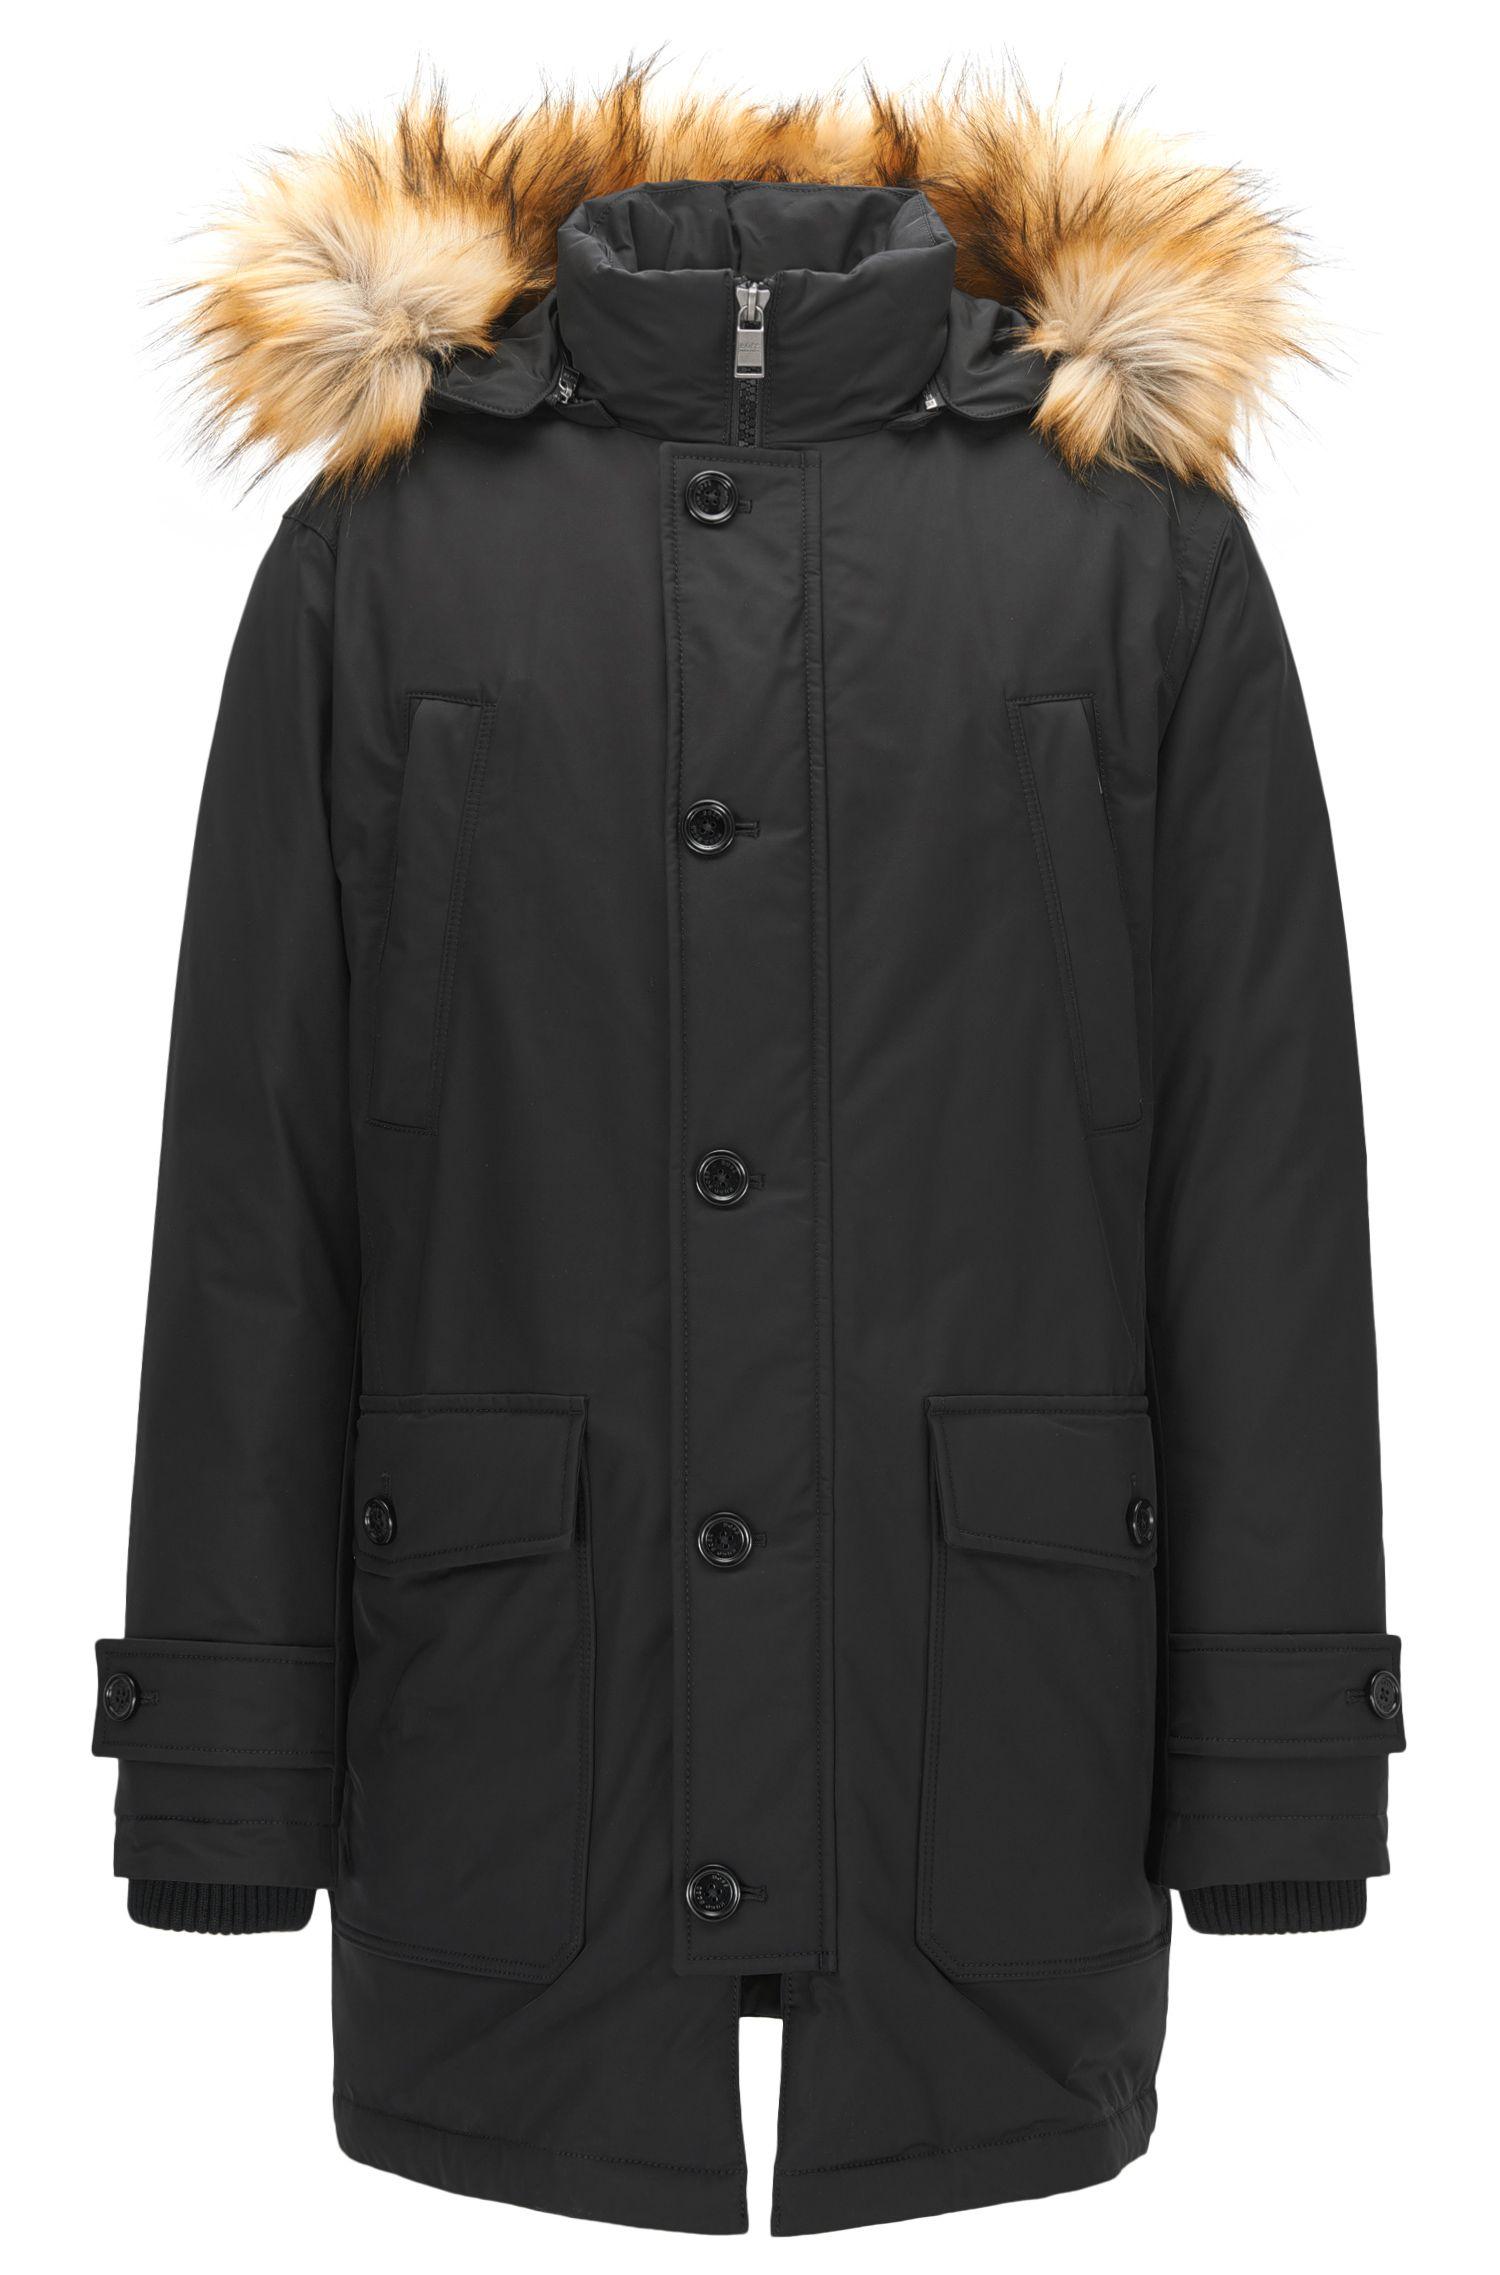 Faux Fur-Trim Parka | Delano , Black